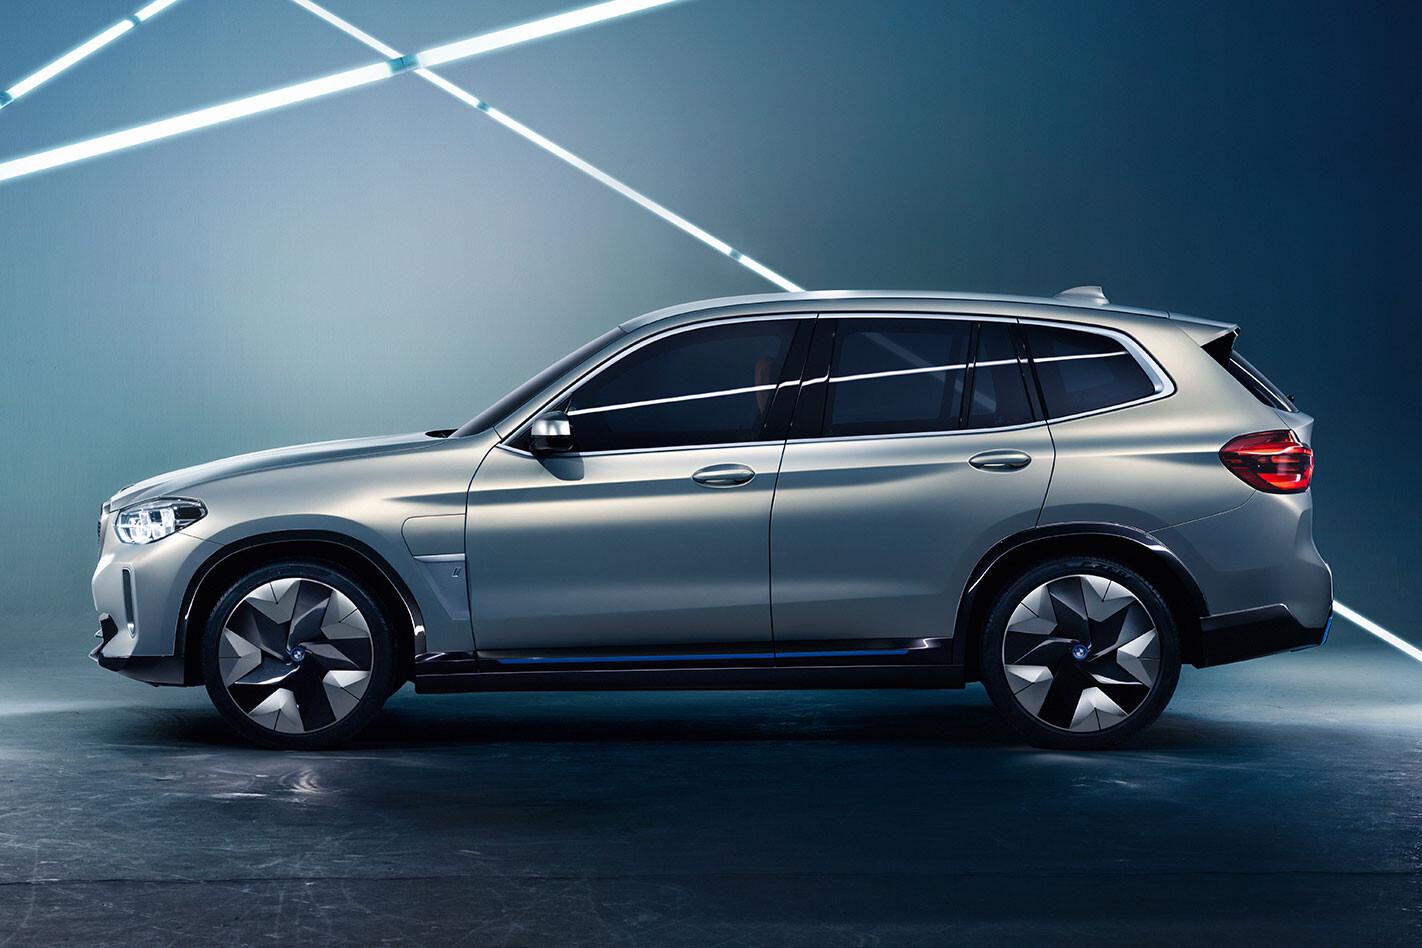 2018 BMW iX3 Concept